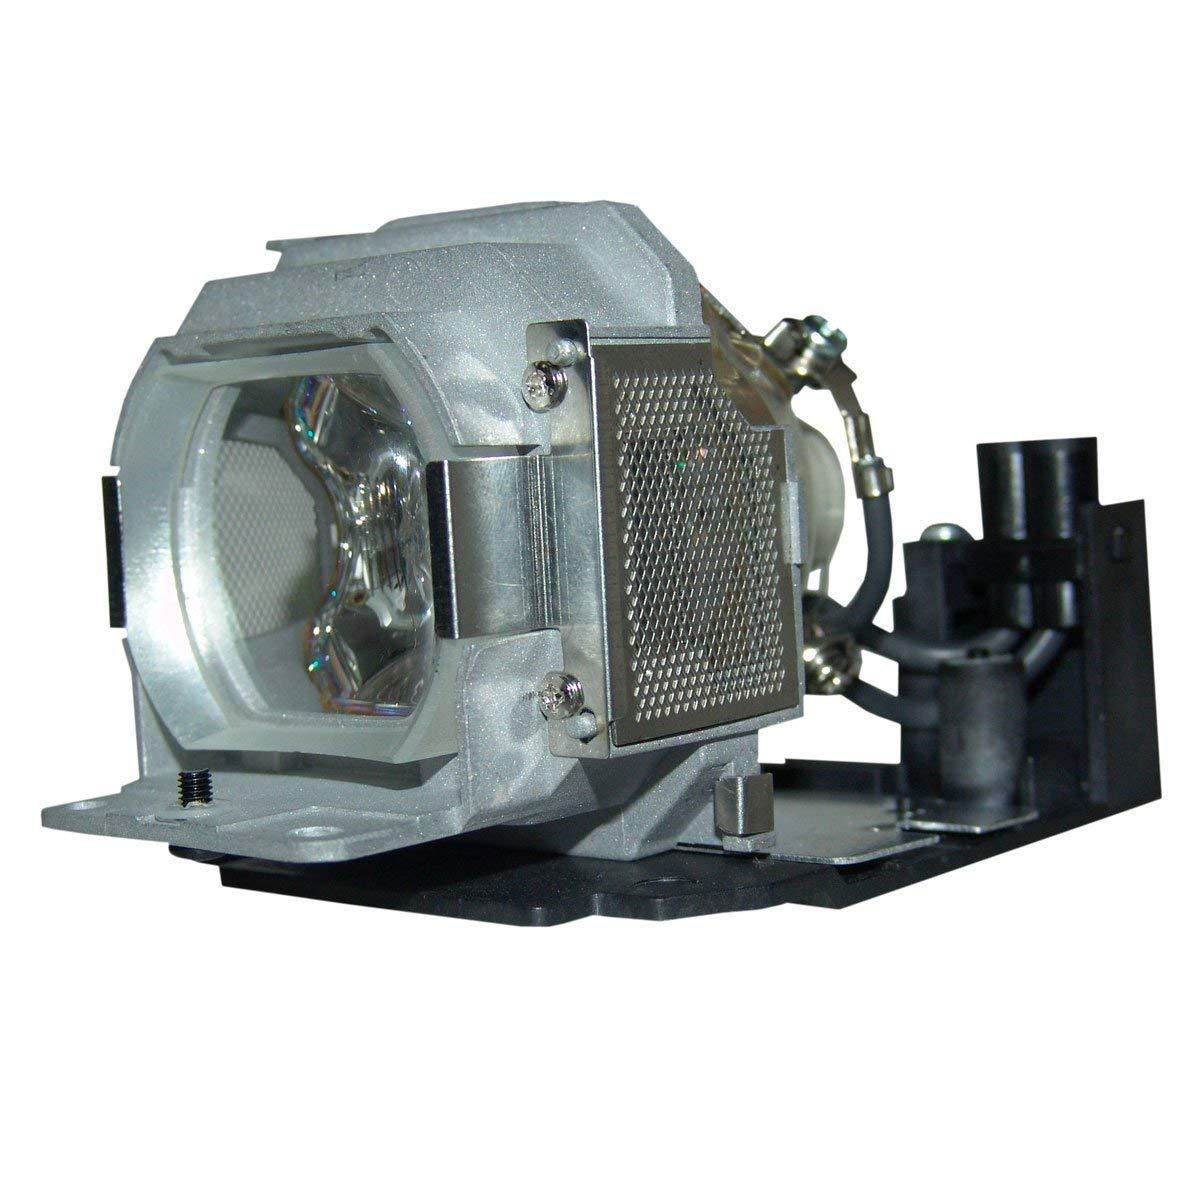 LMP-E190 - Lá mpara de repuesto para proyector Sony VPL-ES5/VPL-EX5/VPL-EX50/VPL-EW5 Supermait